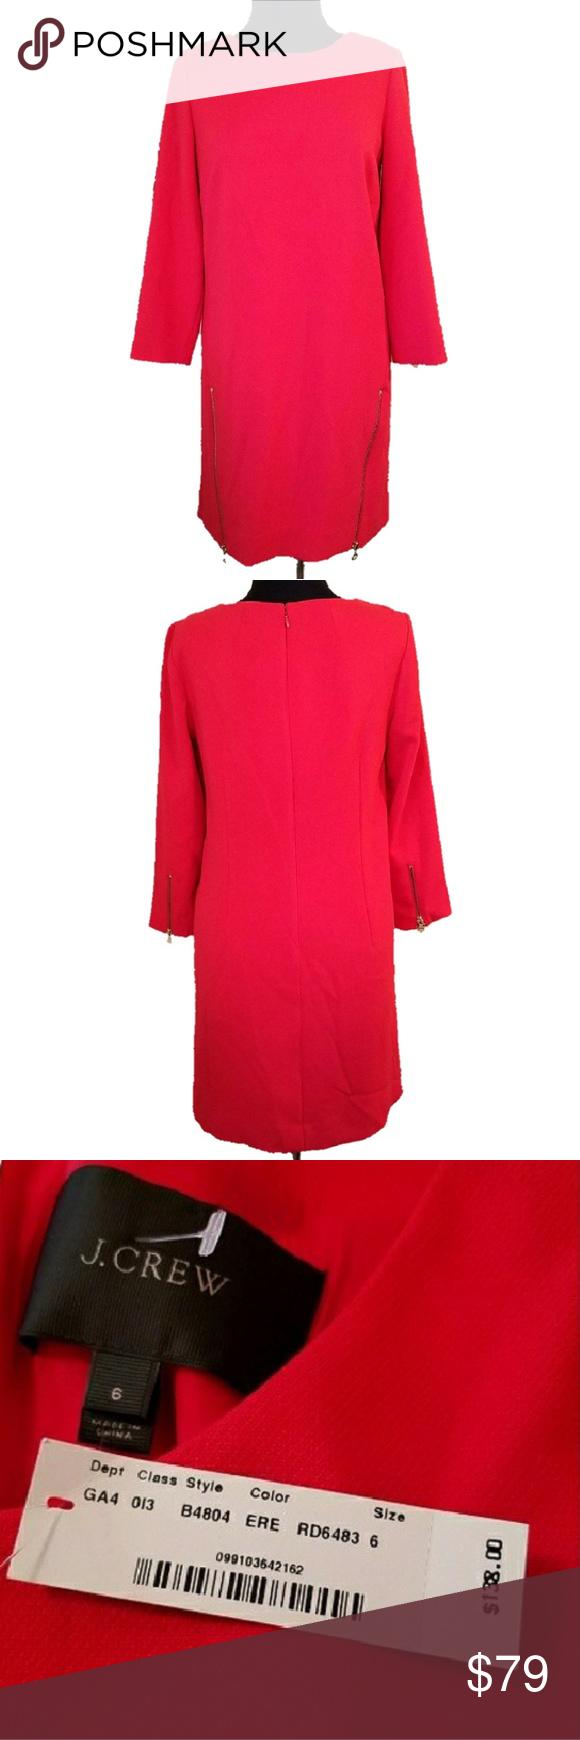 Nwt j crew red sleeve zipper shift dress nwt my posh